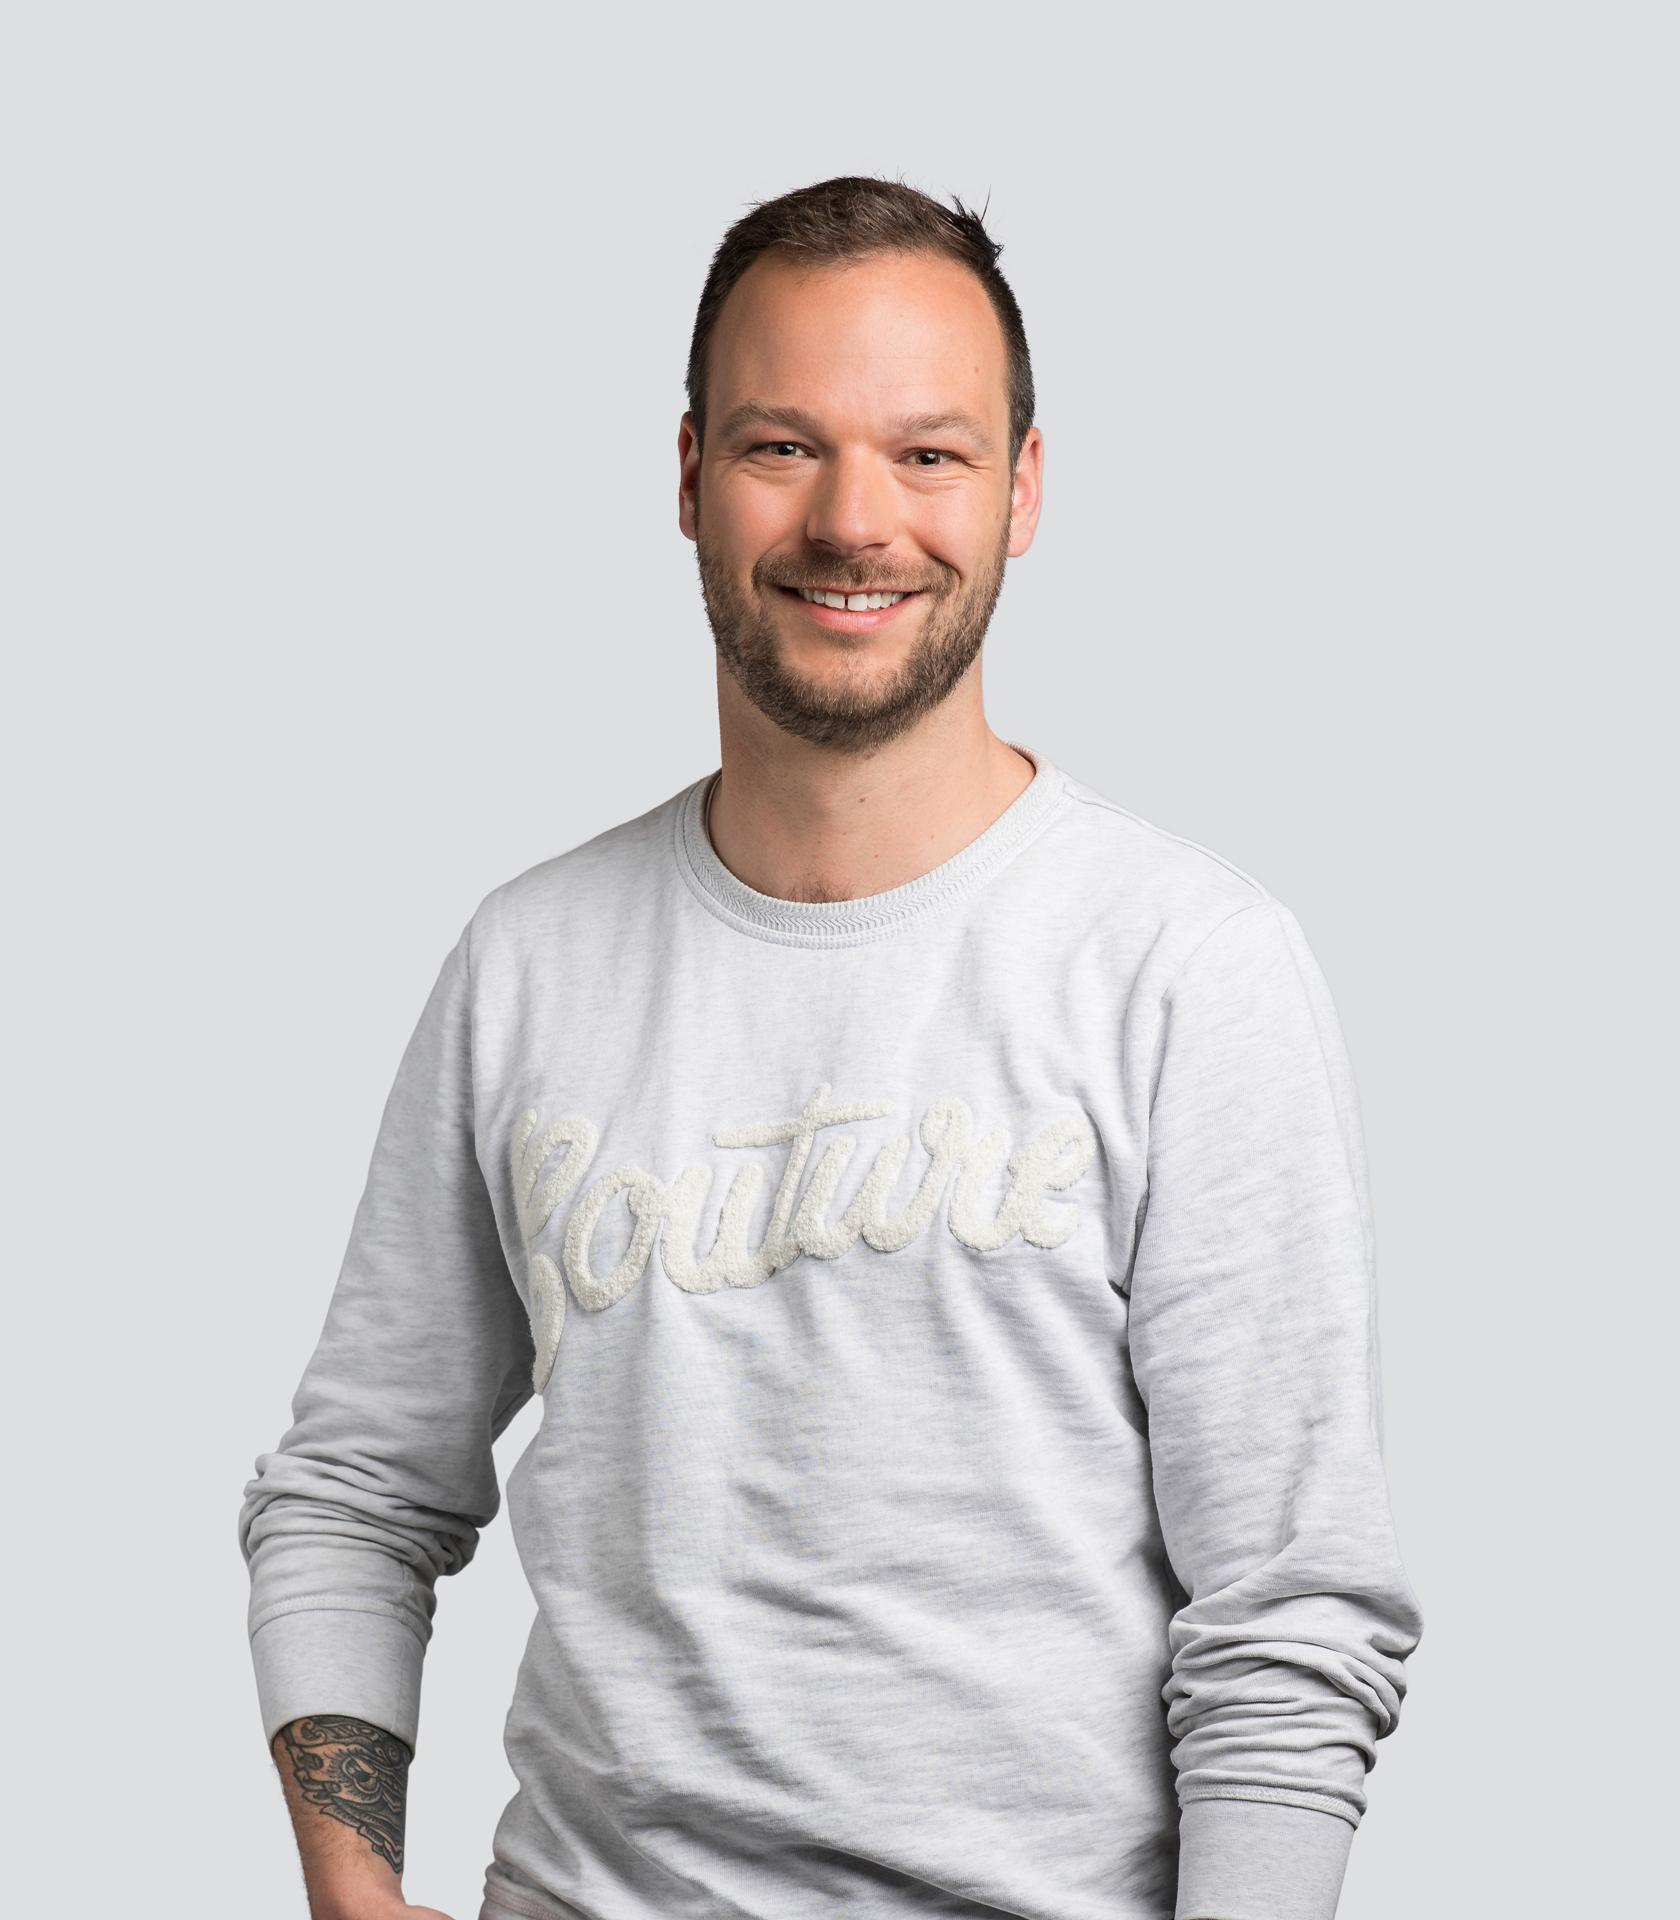 Matthijs Idema